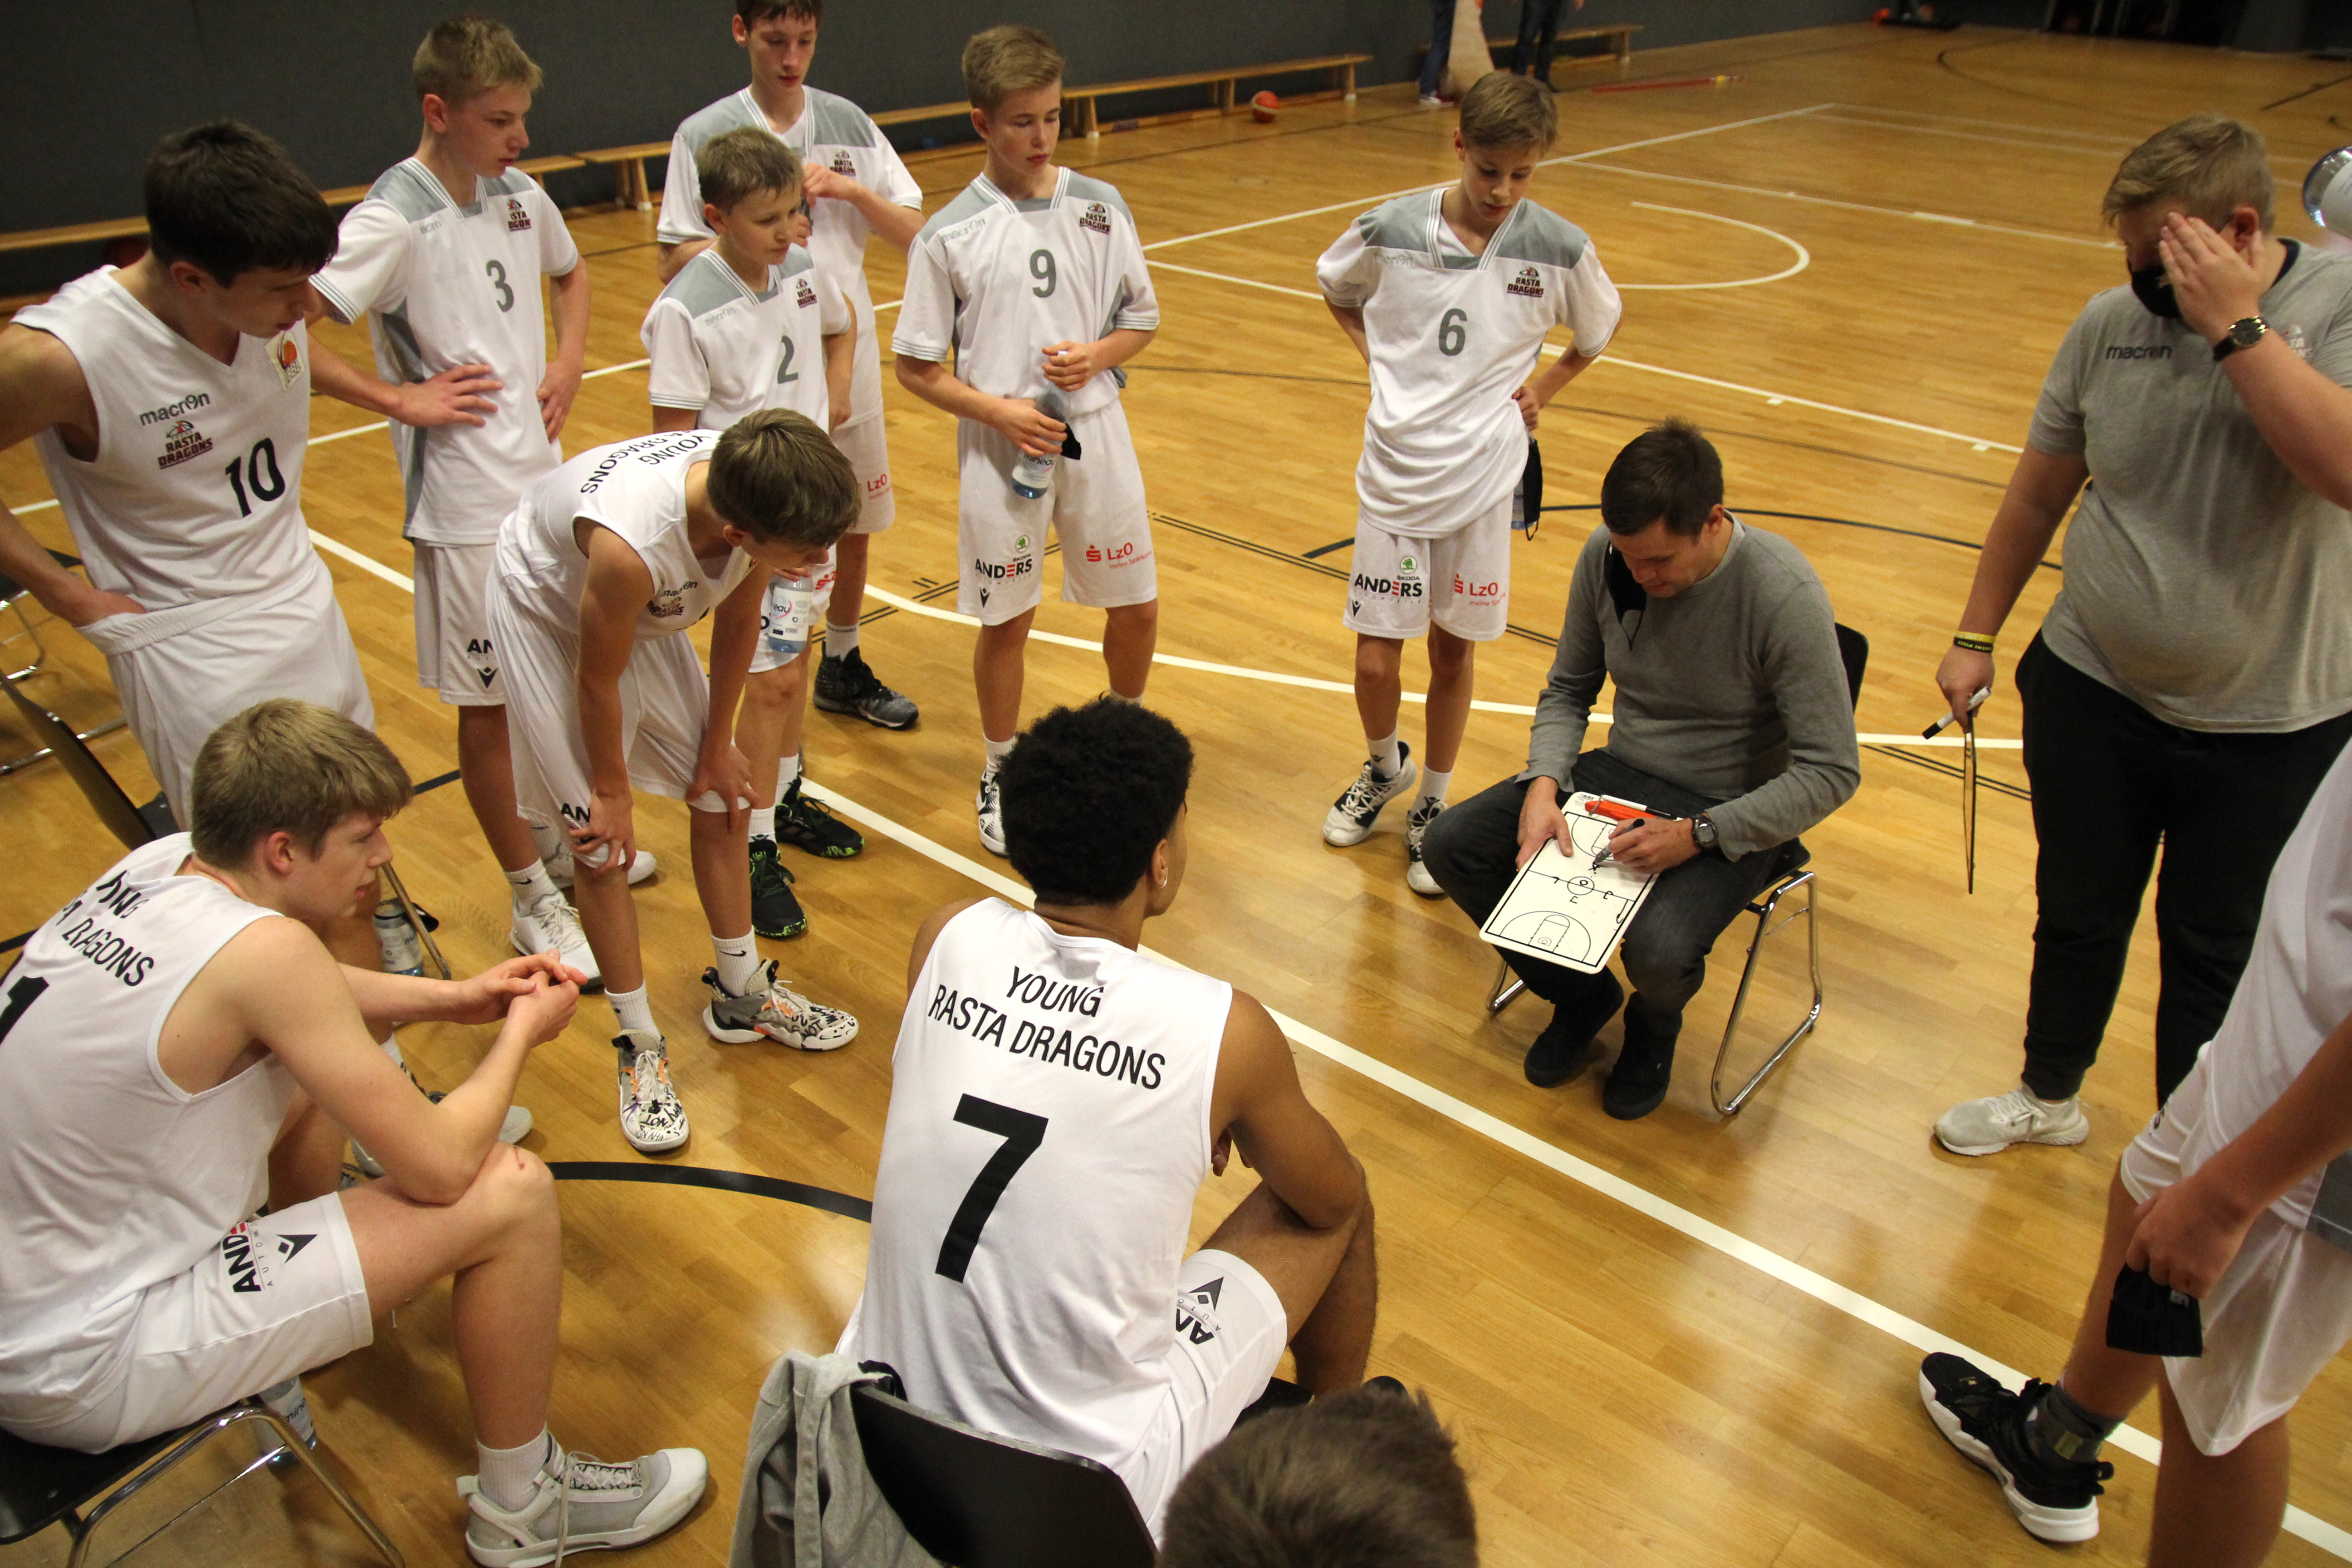 JBBL_20-21_YOUNG-RASTA-DRAGONS_Paderborn_Spieltag2_Team